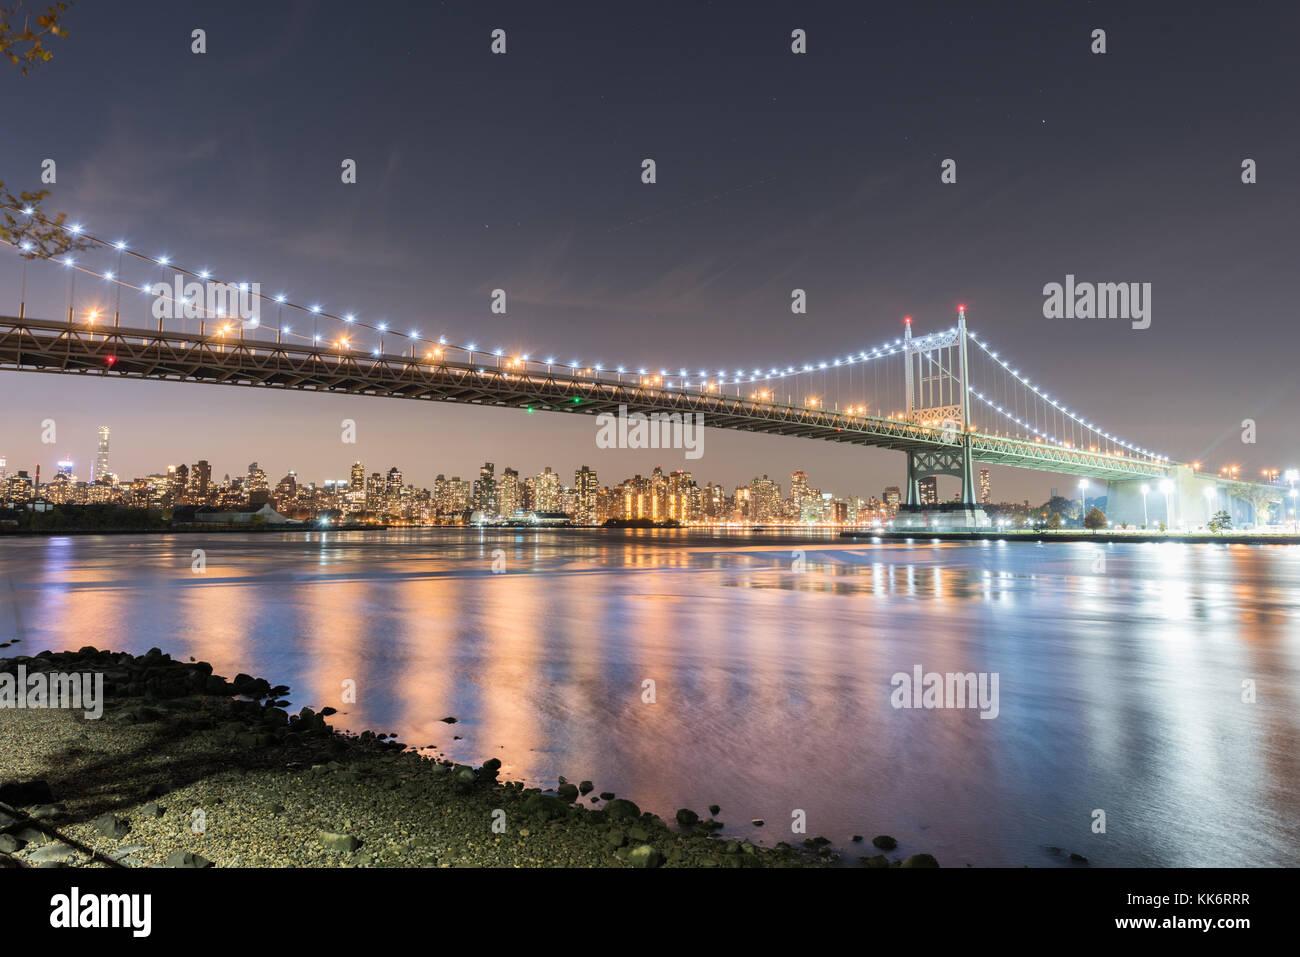 Robert F. Kennedy Bridge (aka Triboro Bridge) at night, in Astoria, Queens, New York - Stock Image